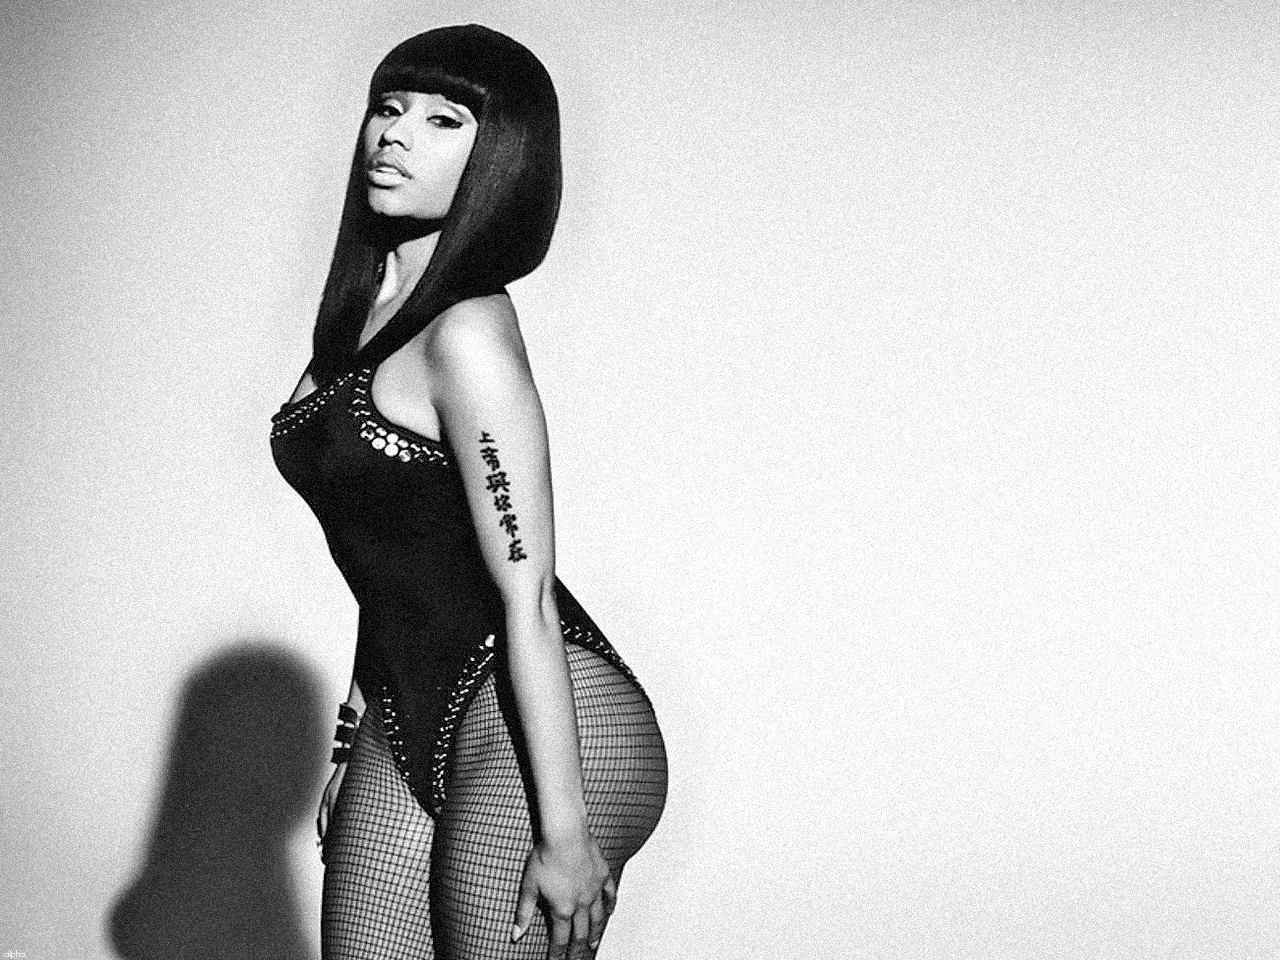 Nicki Nicki Minaj Wallpaper 18576292 Fanpop